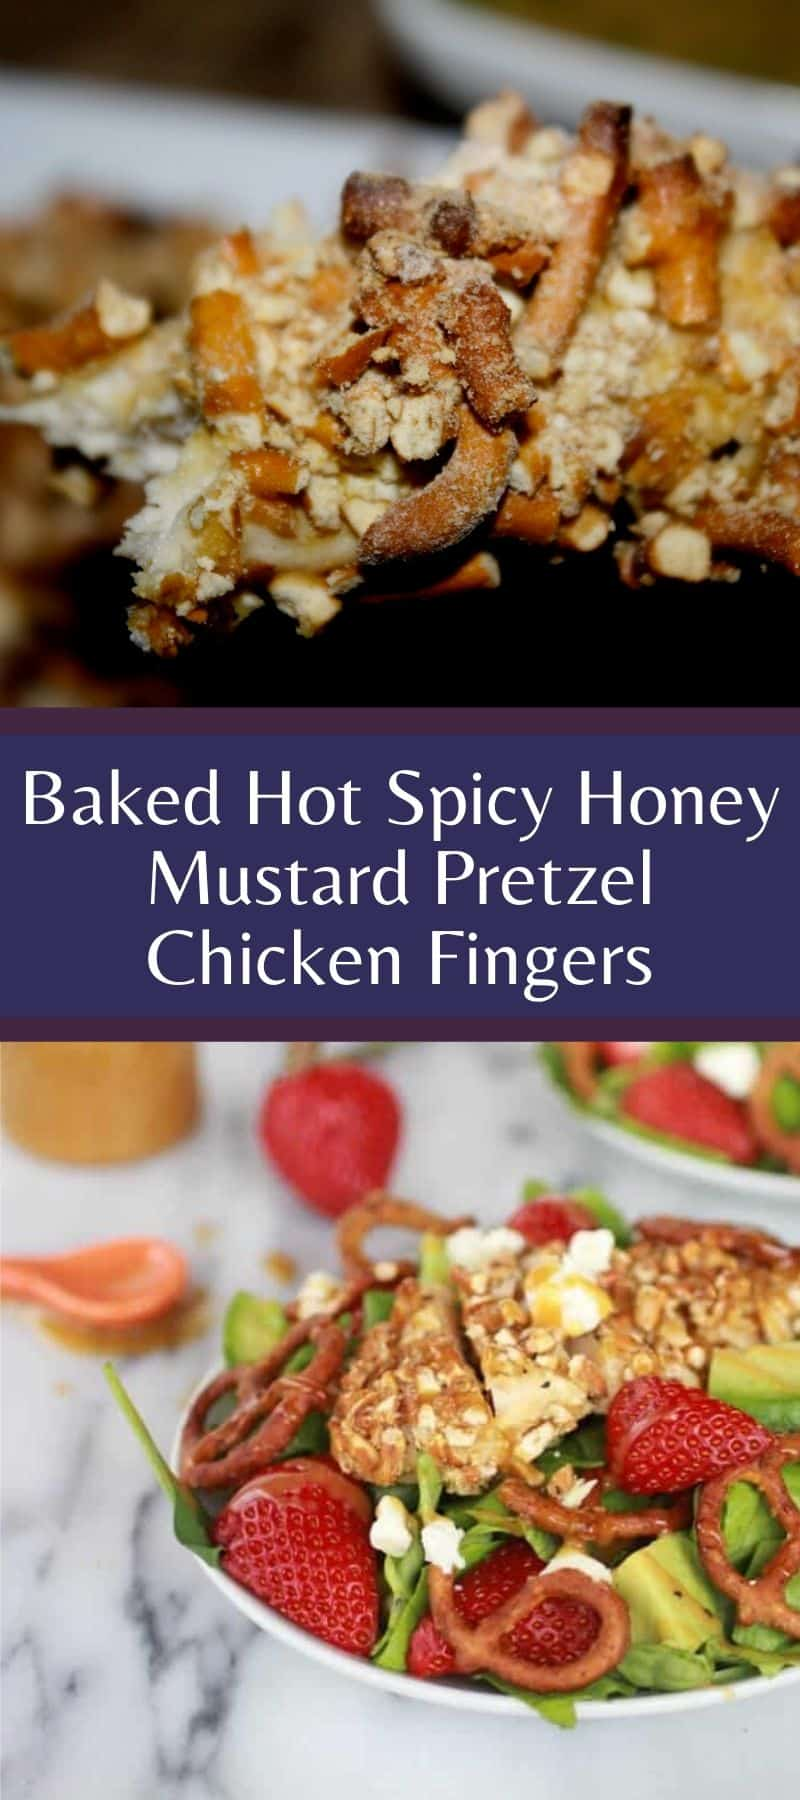 Baked Hot Spicy Honey Mustard Pretzel Chicken Fingers 3